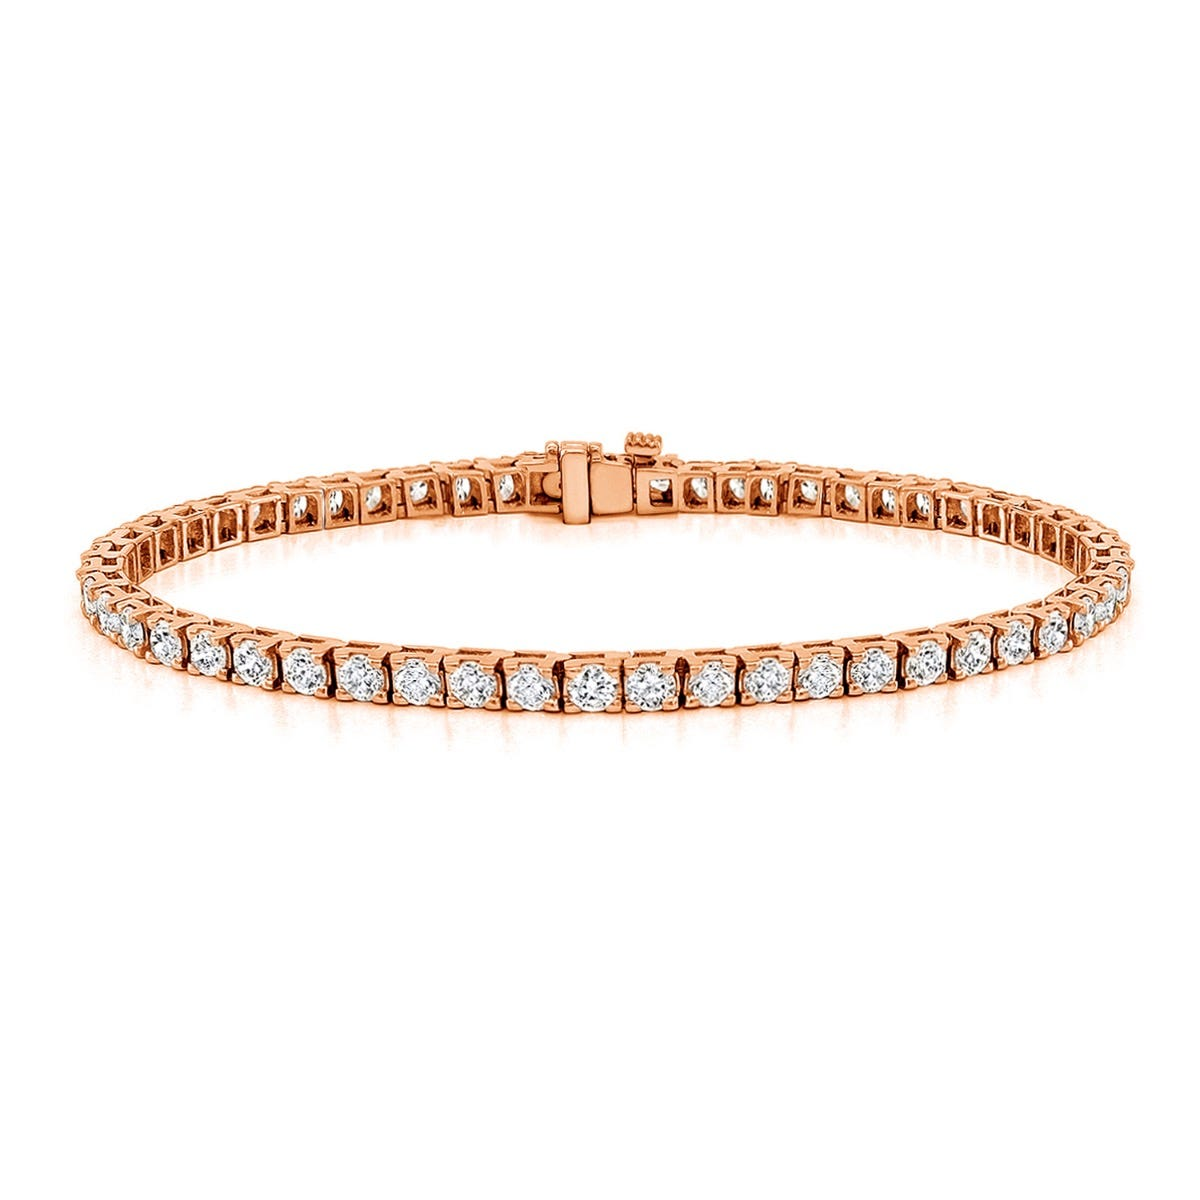 4ctw. 4-Prong Square Link Diamond Tennis Bracelet in 14K Rose Gold (HI, SI1-SI2)